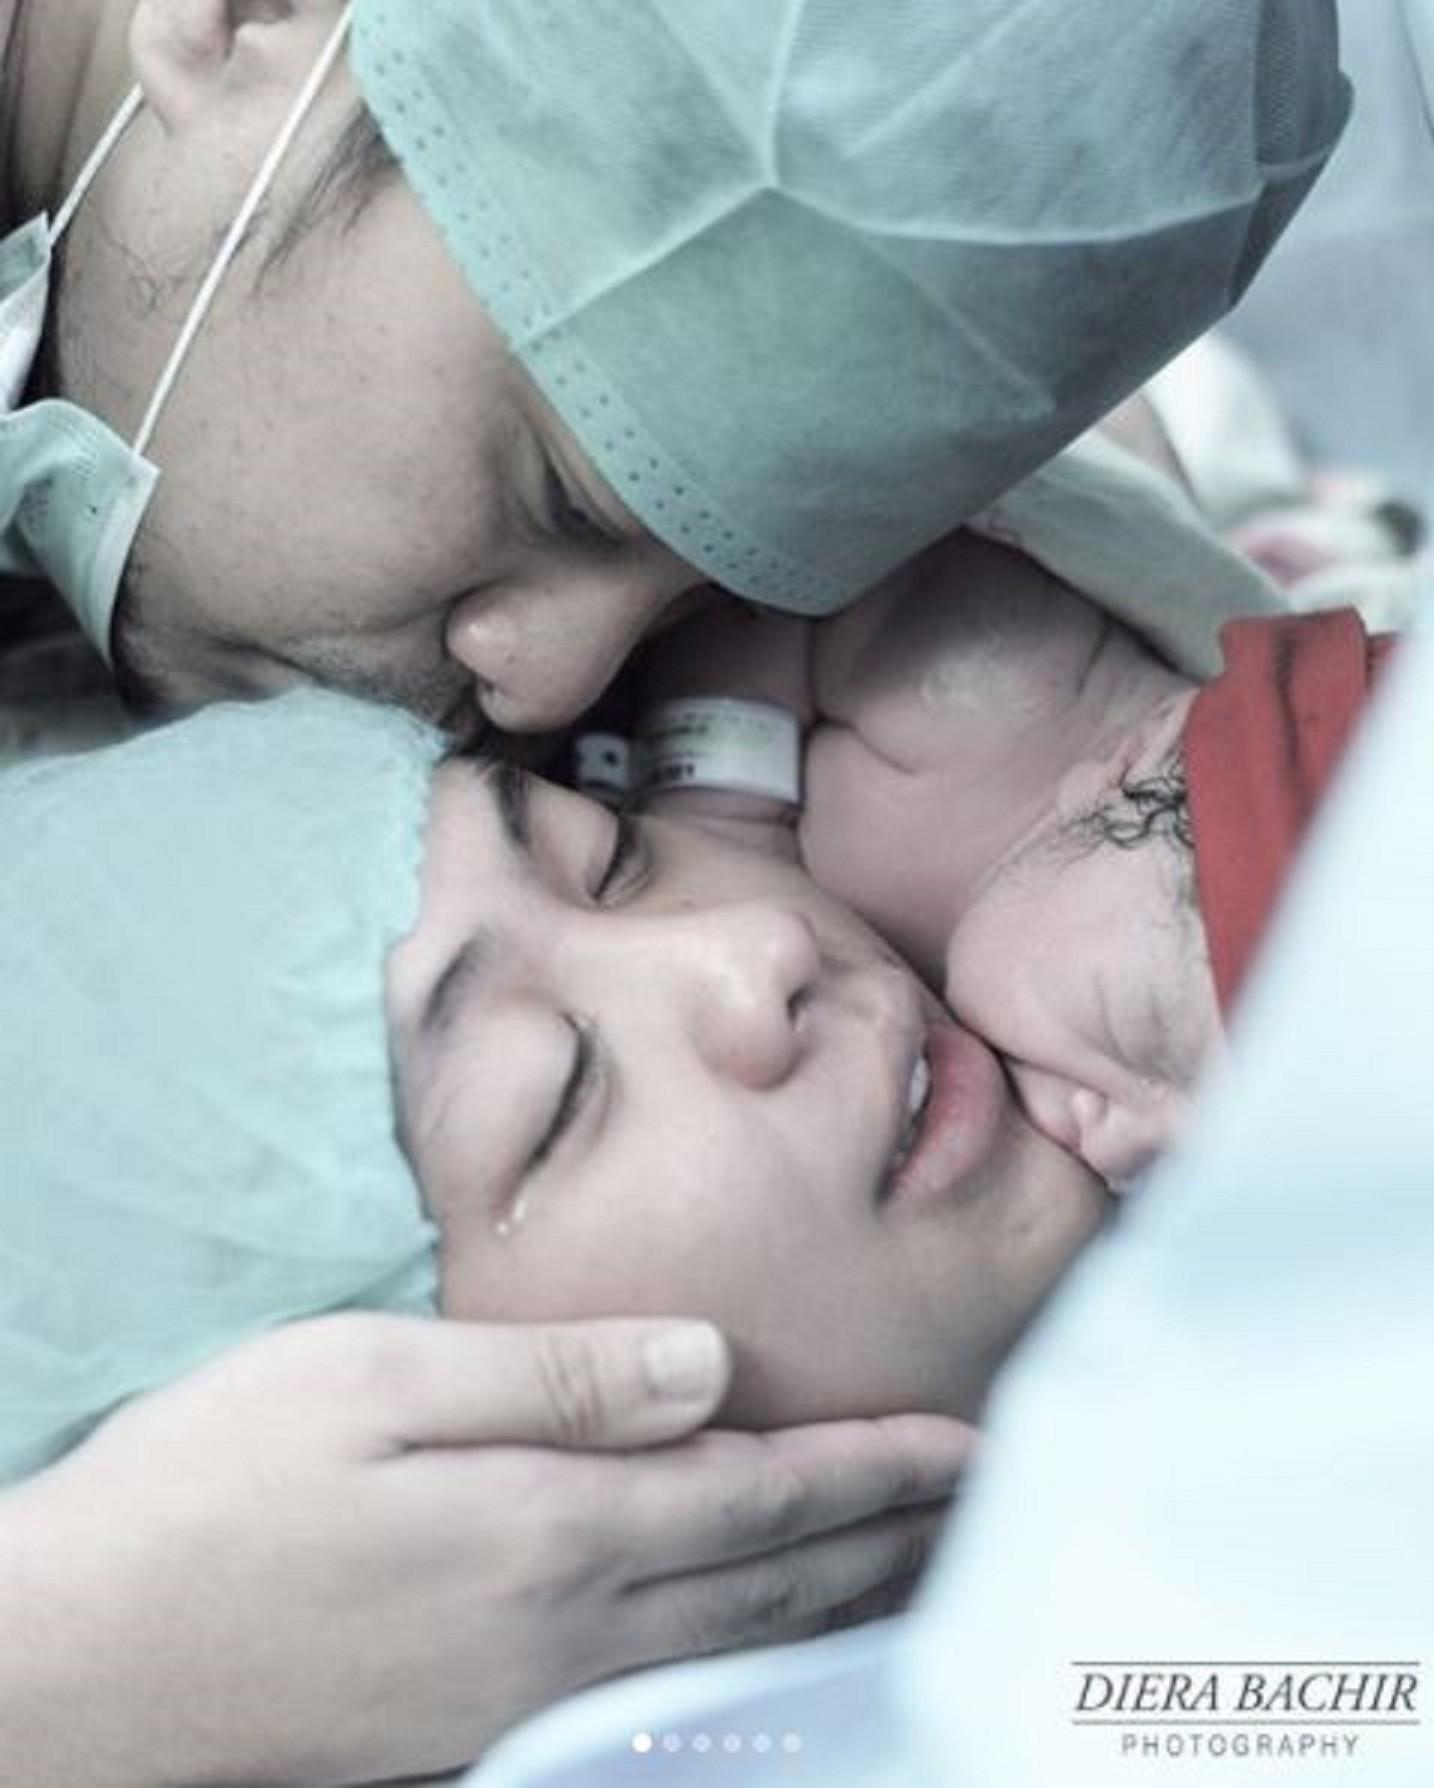 Oki Setiana Dewi melahirkan anak ketiganya (Instagram/@dierabachir)